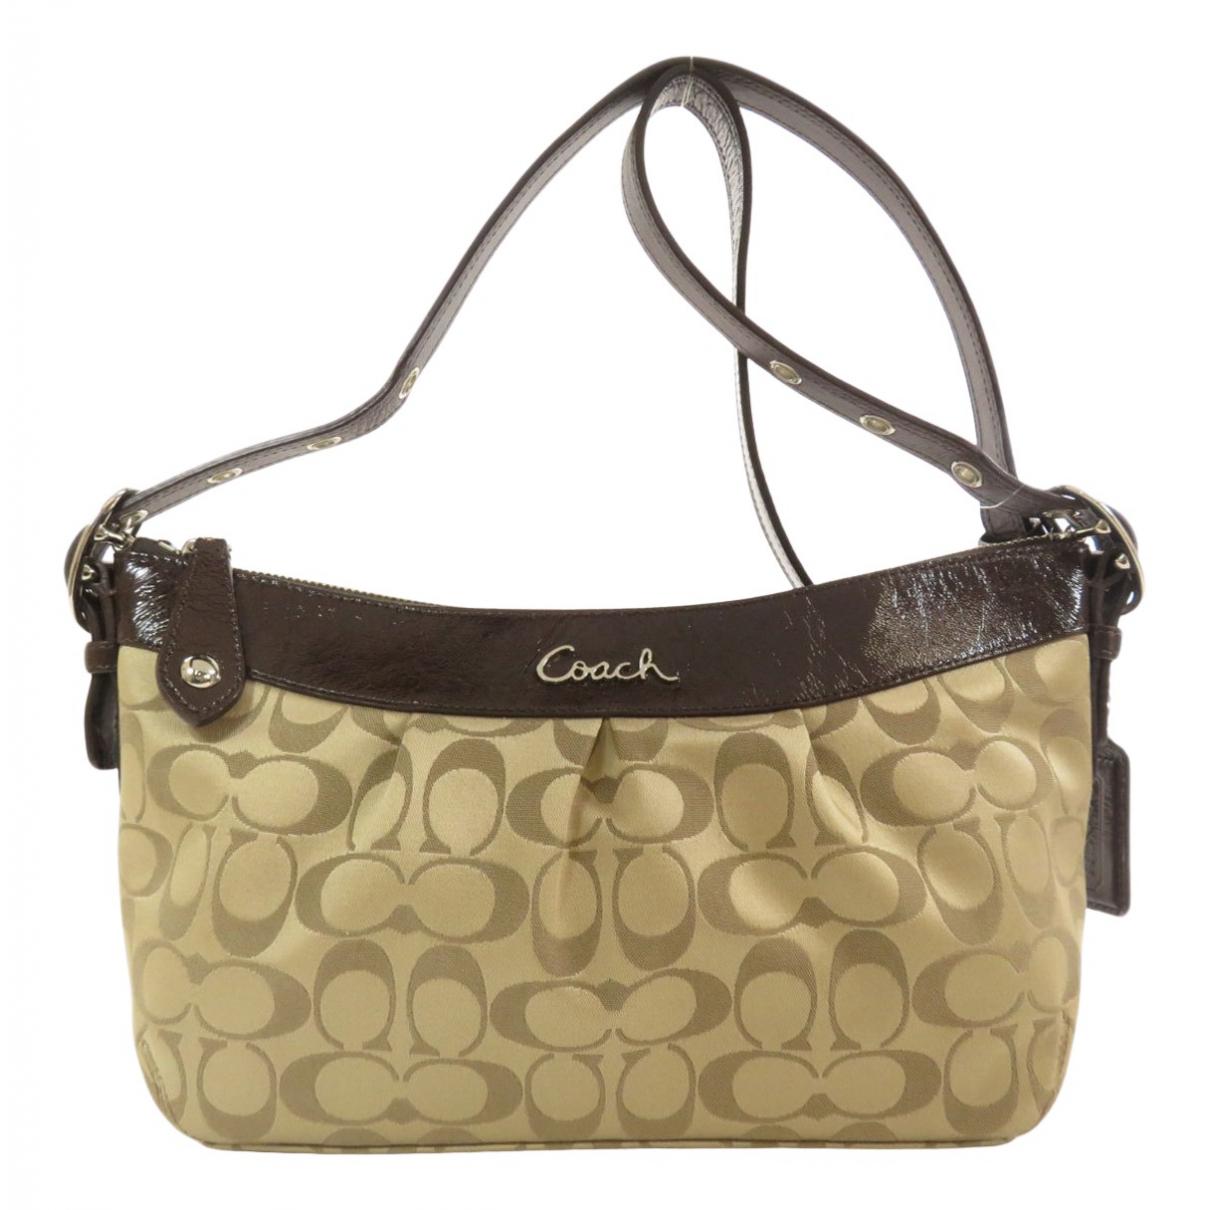 Coach \N Beige Cloth Clutch bag for Women \N